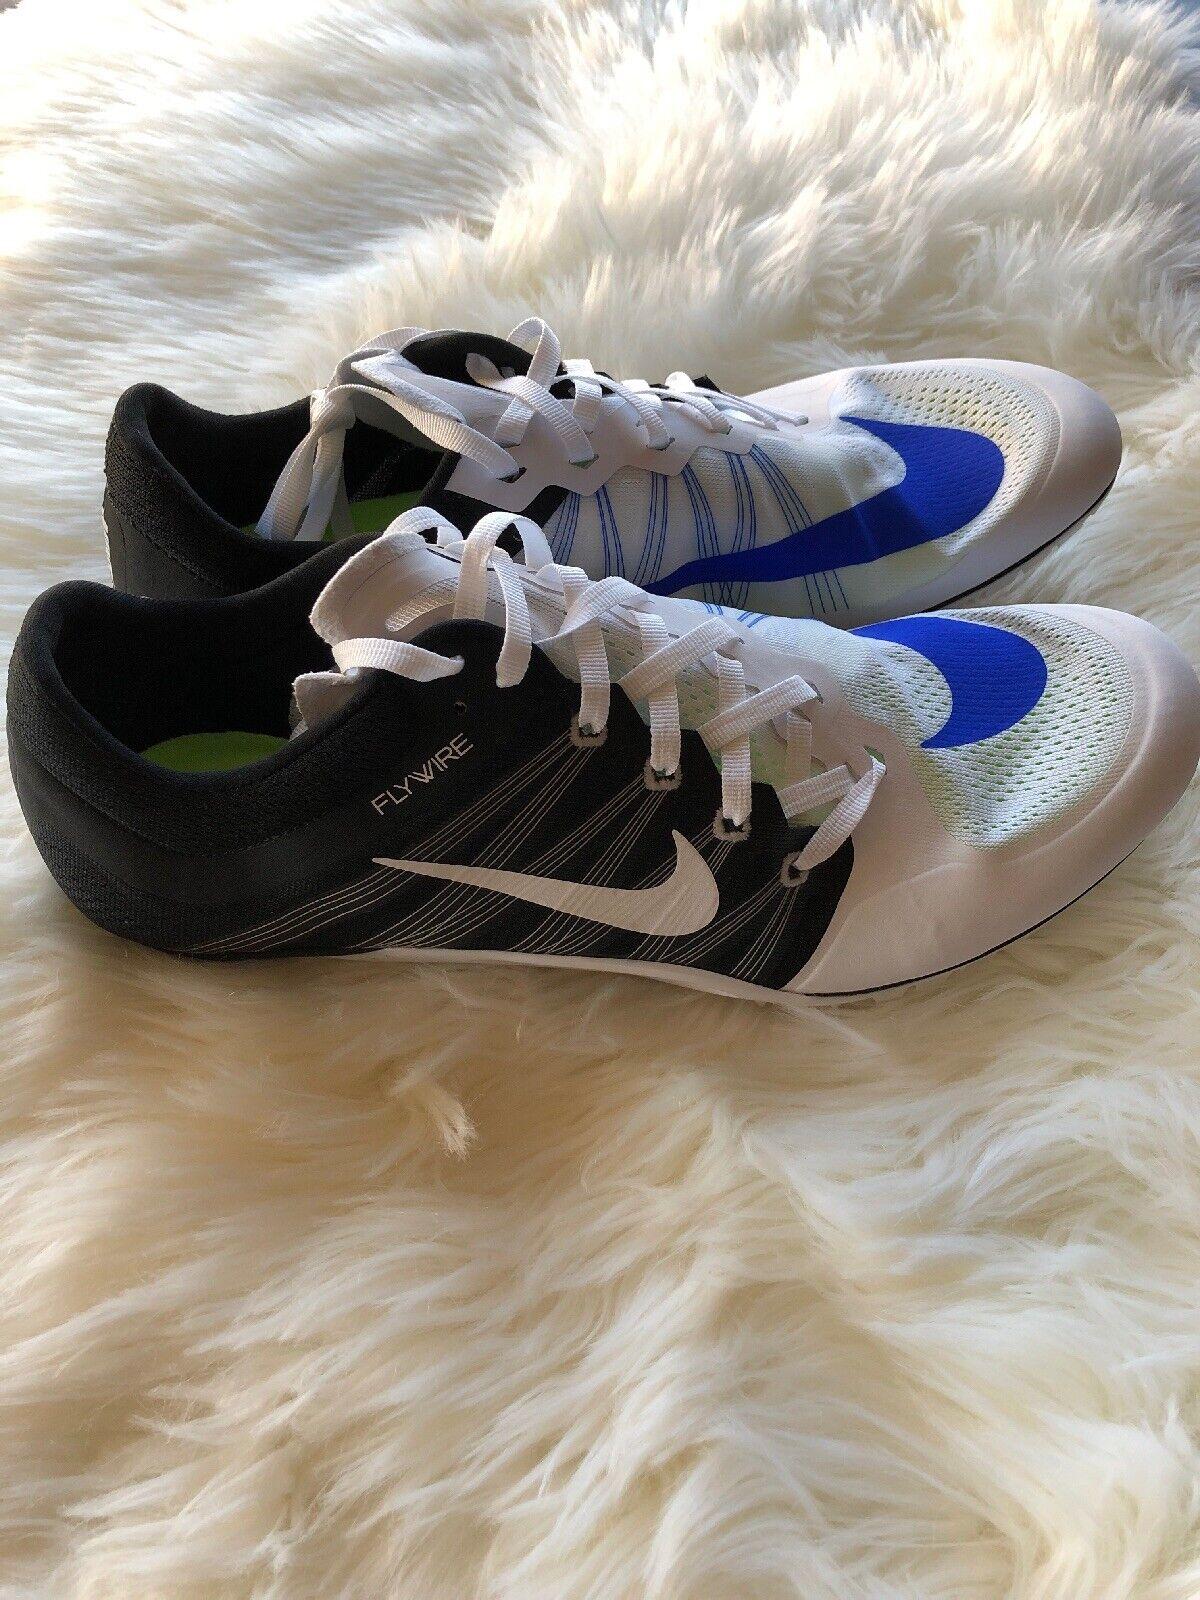 Nike zoom ja mosca 2 binari spuntoni bianco nero 705373-100 uomini e 13 nuovi | Facile Da Pulire Surface  | Sig/Sig Ra Scarpa